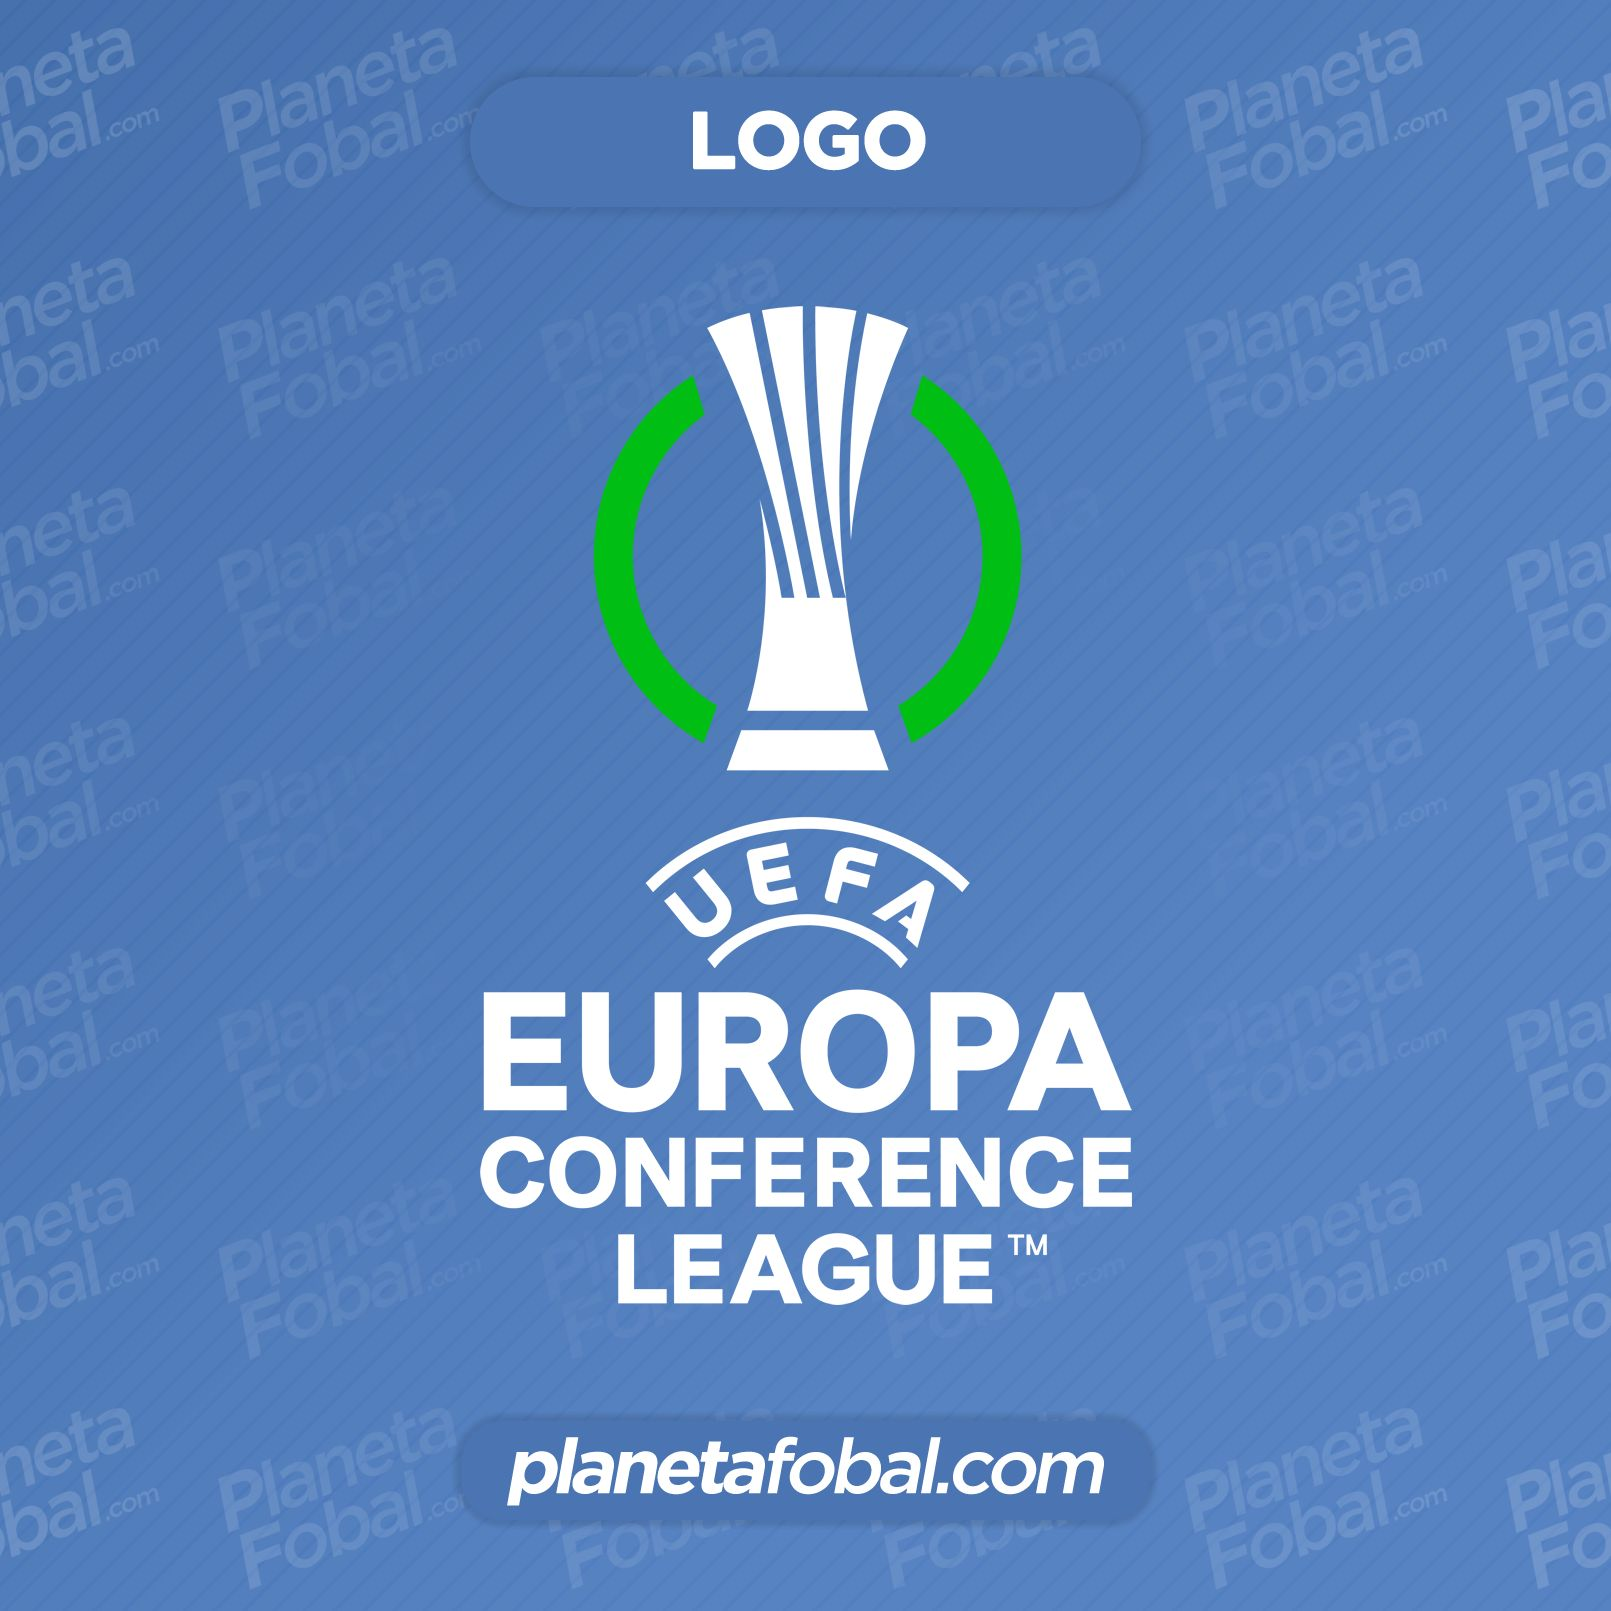 Logo oficial de la UEFA Europa Conference League